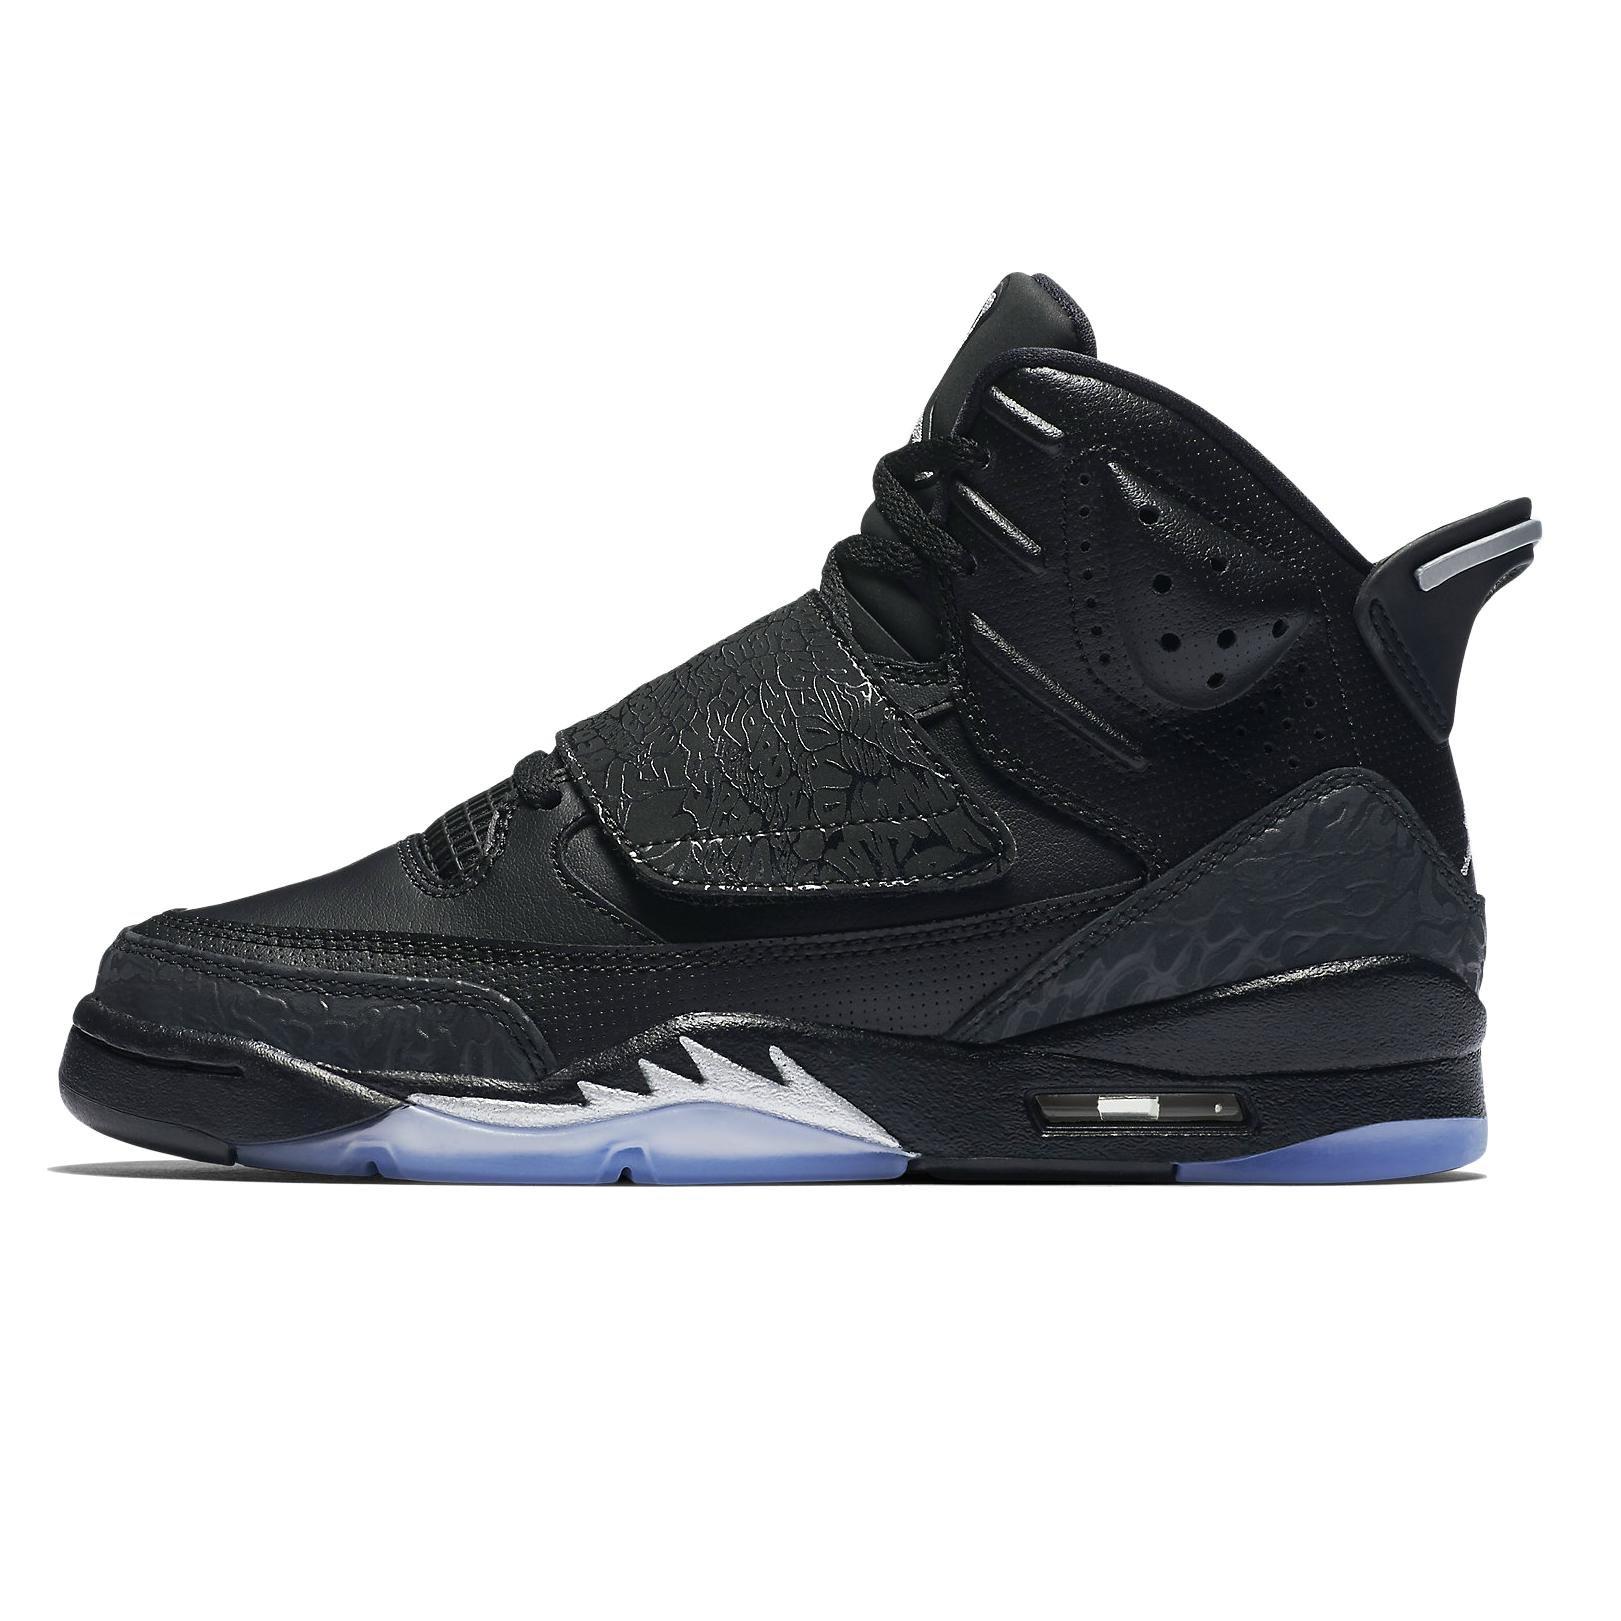 Jordan JORDAN SON OF BG BOYS basketball-shoes 512246-010_6Y - BLACK/METALLIC SILVER-ANTHRACITE